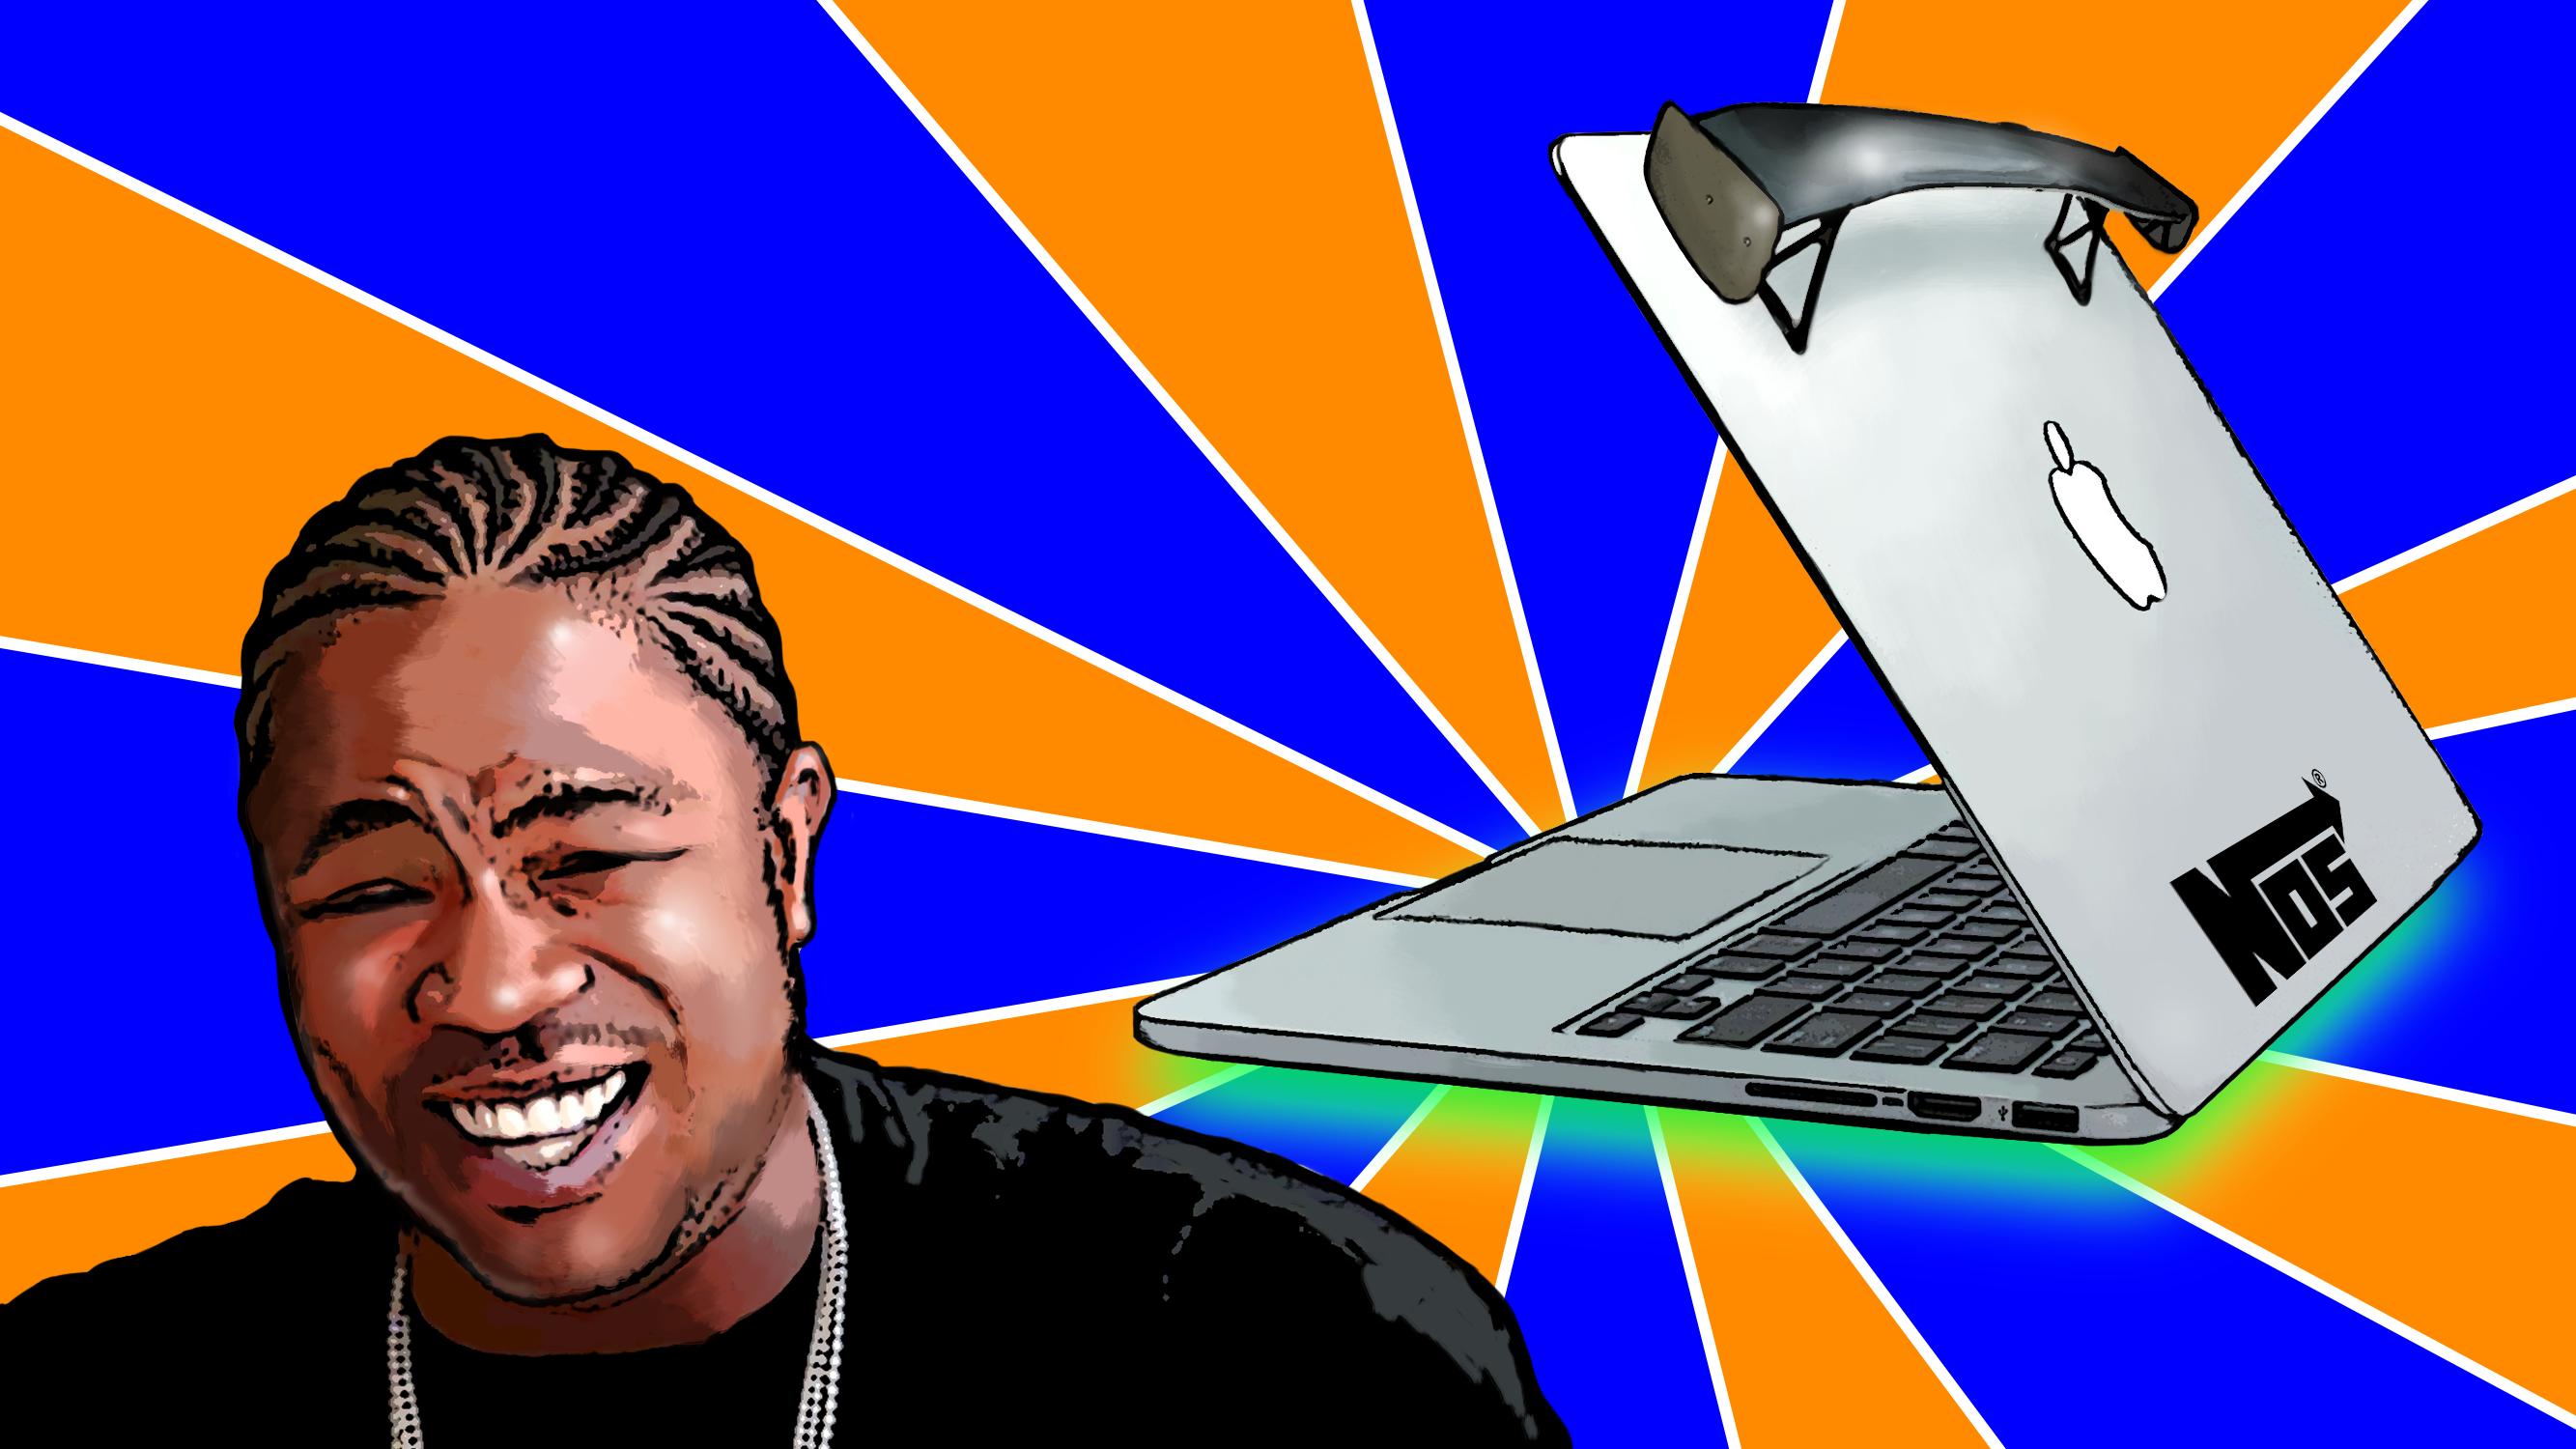 Transcend, прокачай мой MacBook: меняем старый SSD на сверхбыстрый 960 ГБ JetDrive (конкурс завершён)